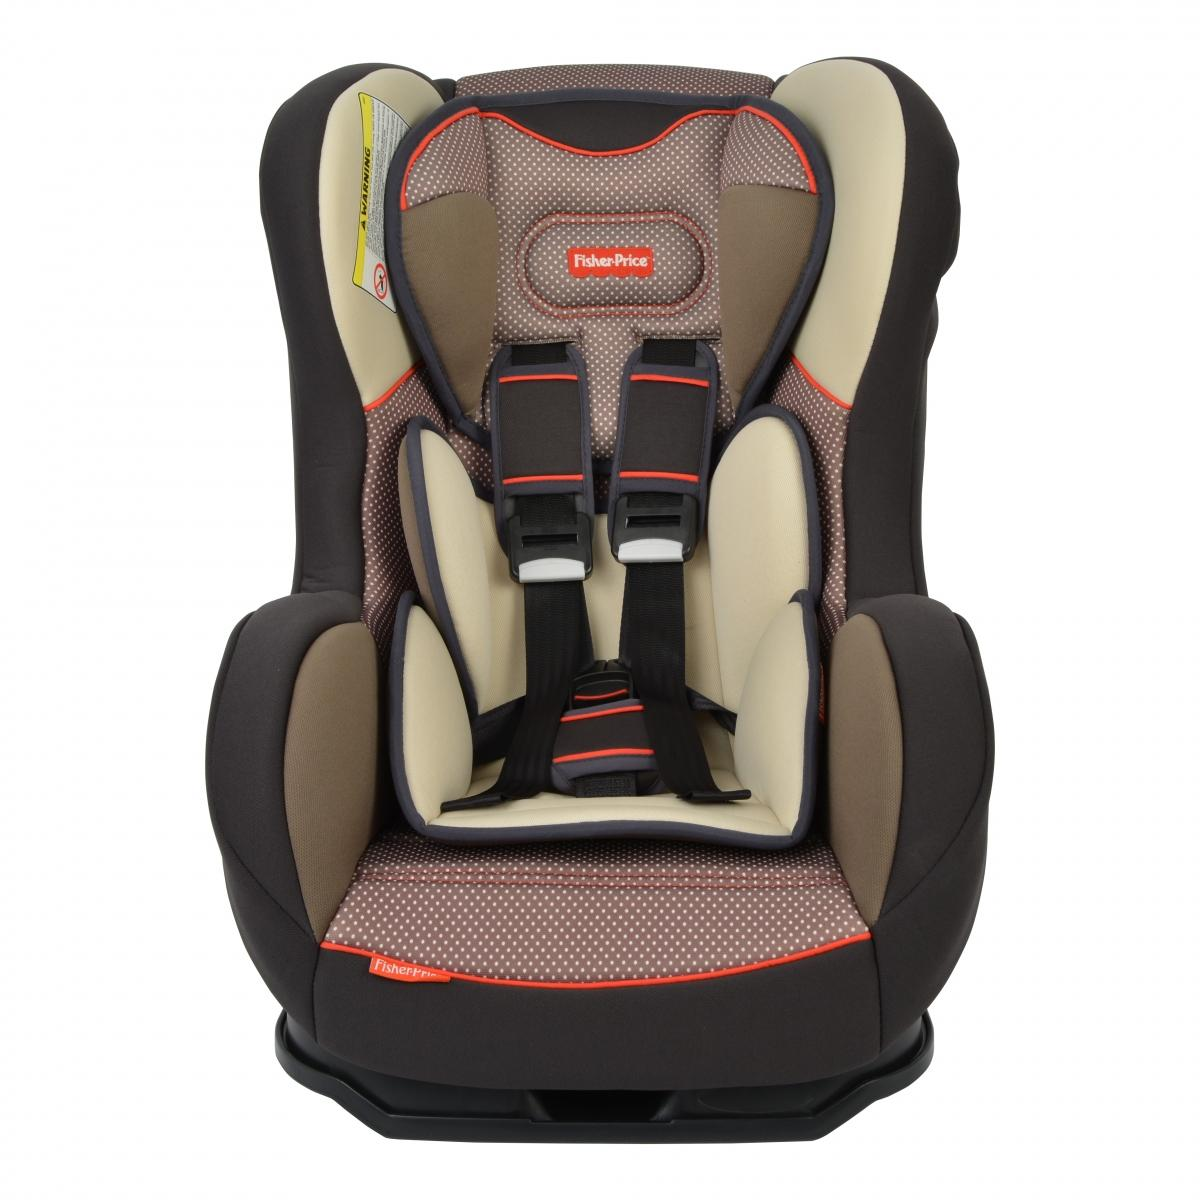 Title Information Fisher Price Baby Car Seat Safe Voyage 450 1